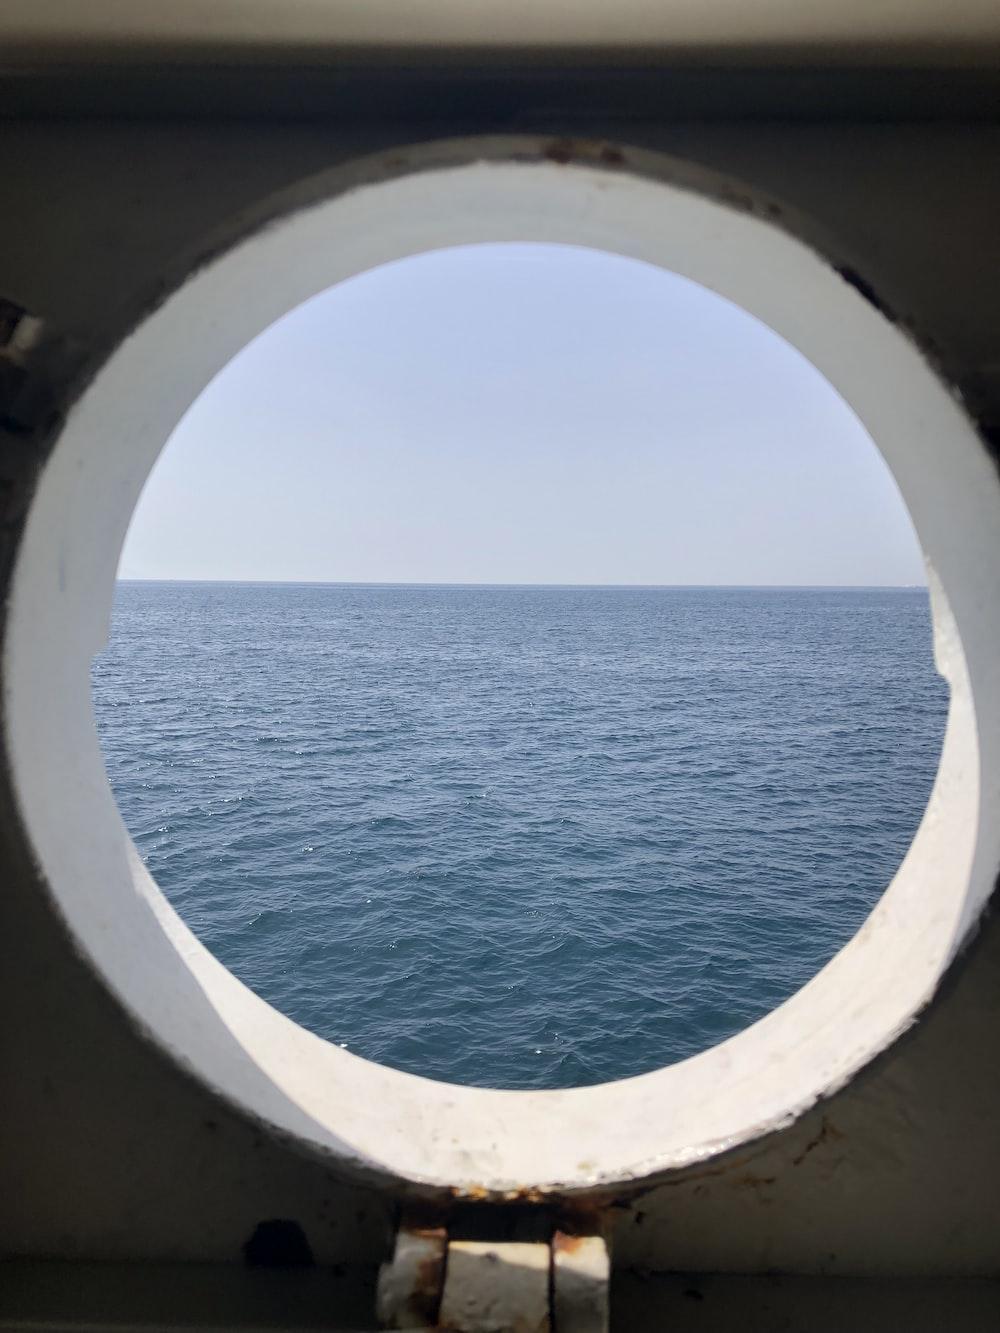 window showing sea during daytime